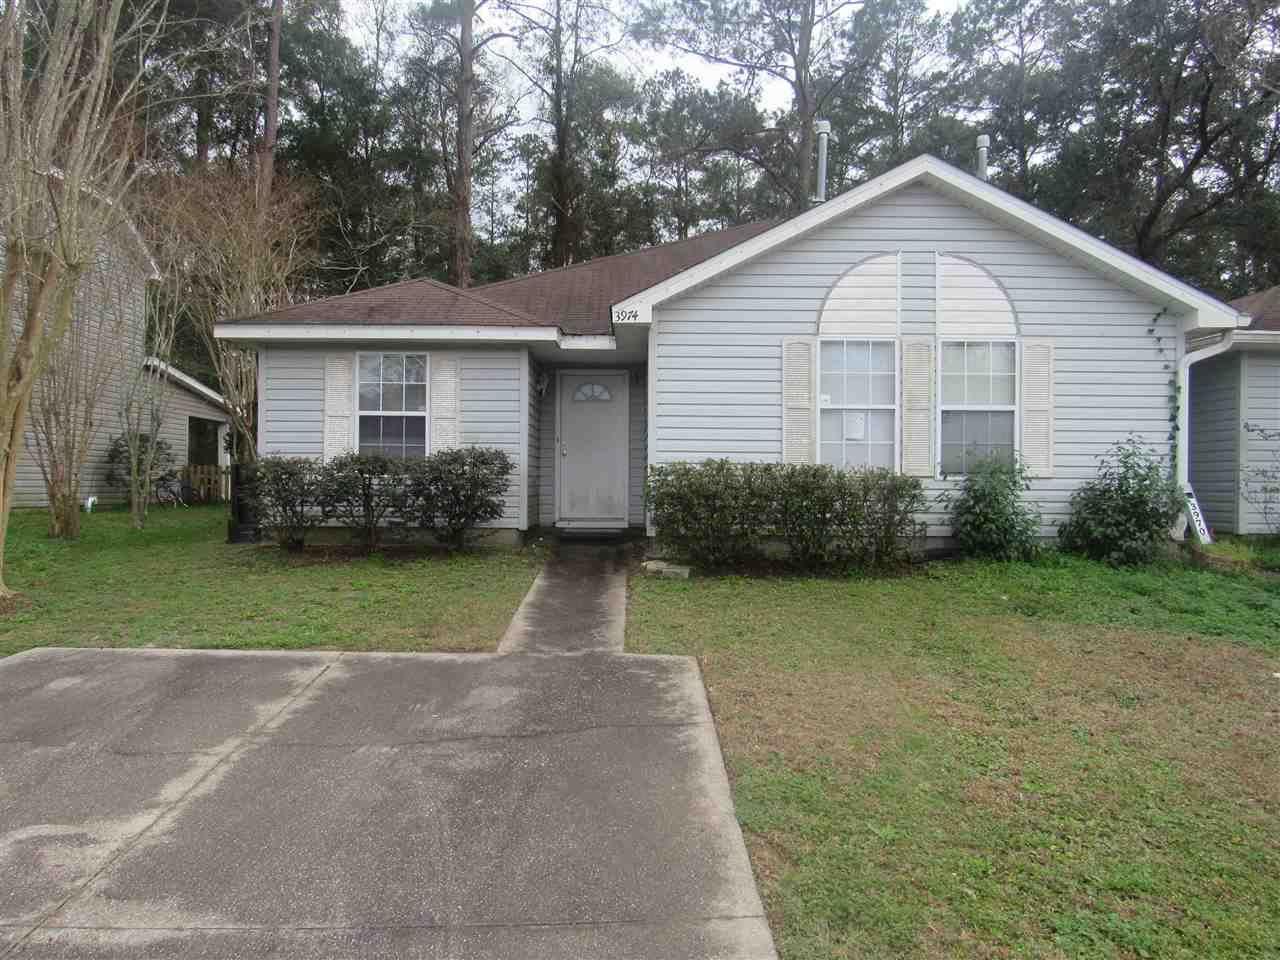 3974 Remer Court, Tallahassee, FL 32303 - MLS#: 328641